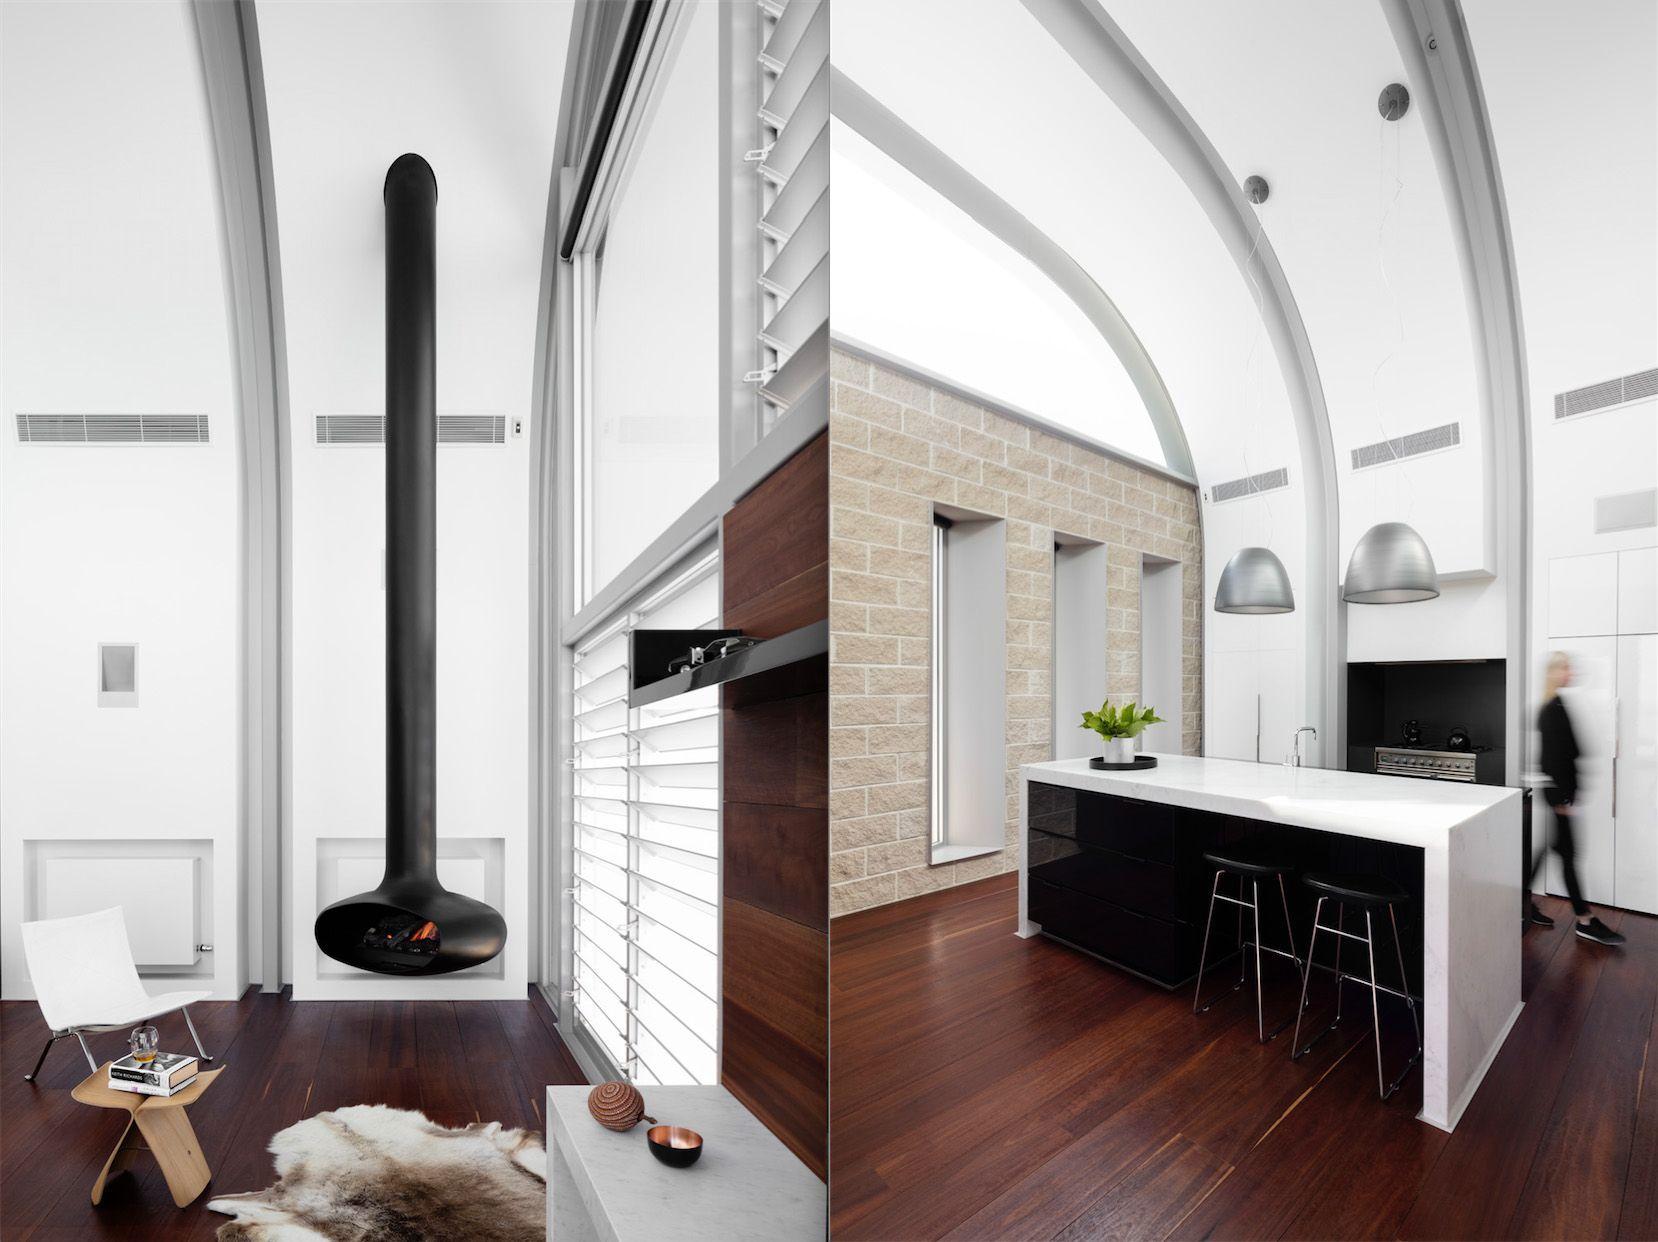 Interiors landscape copy